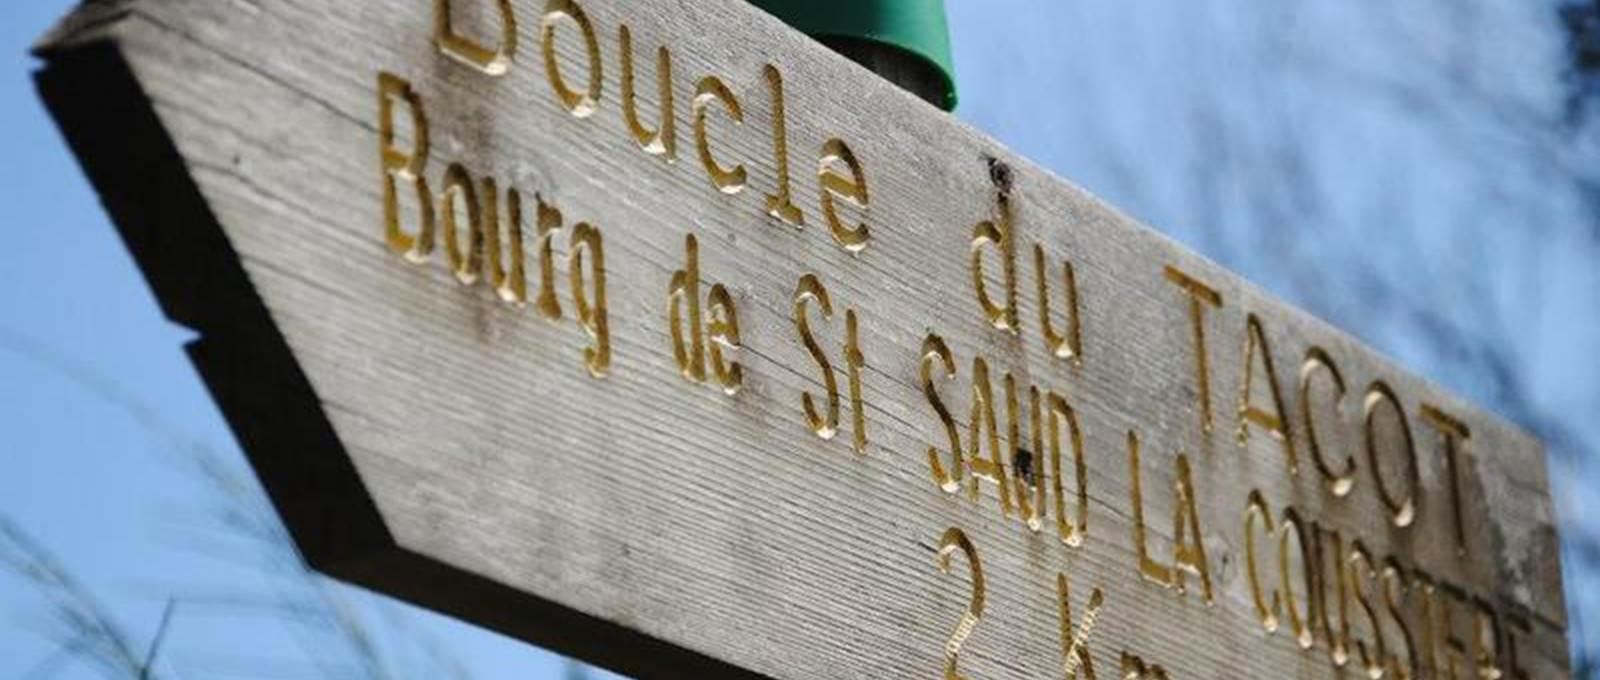 Boucle du Tacot Saint Saud Le Sully en Perigord